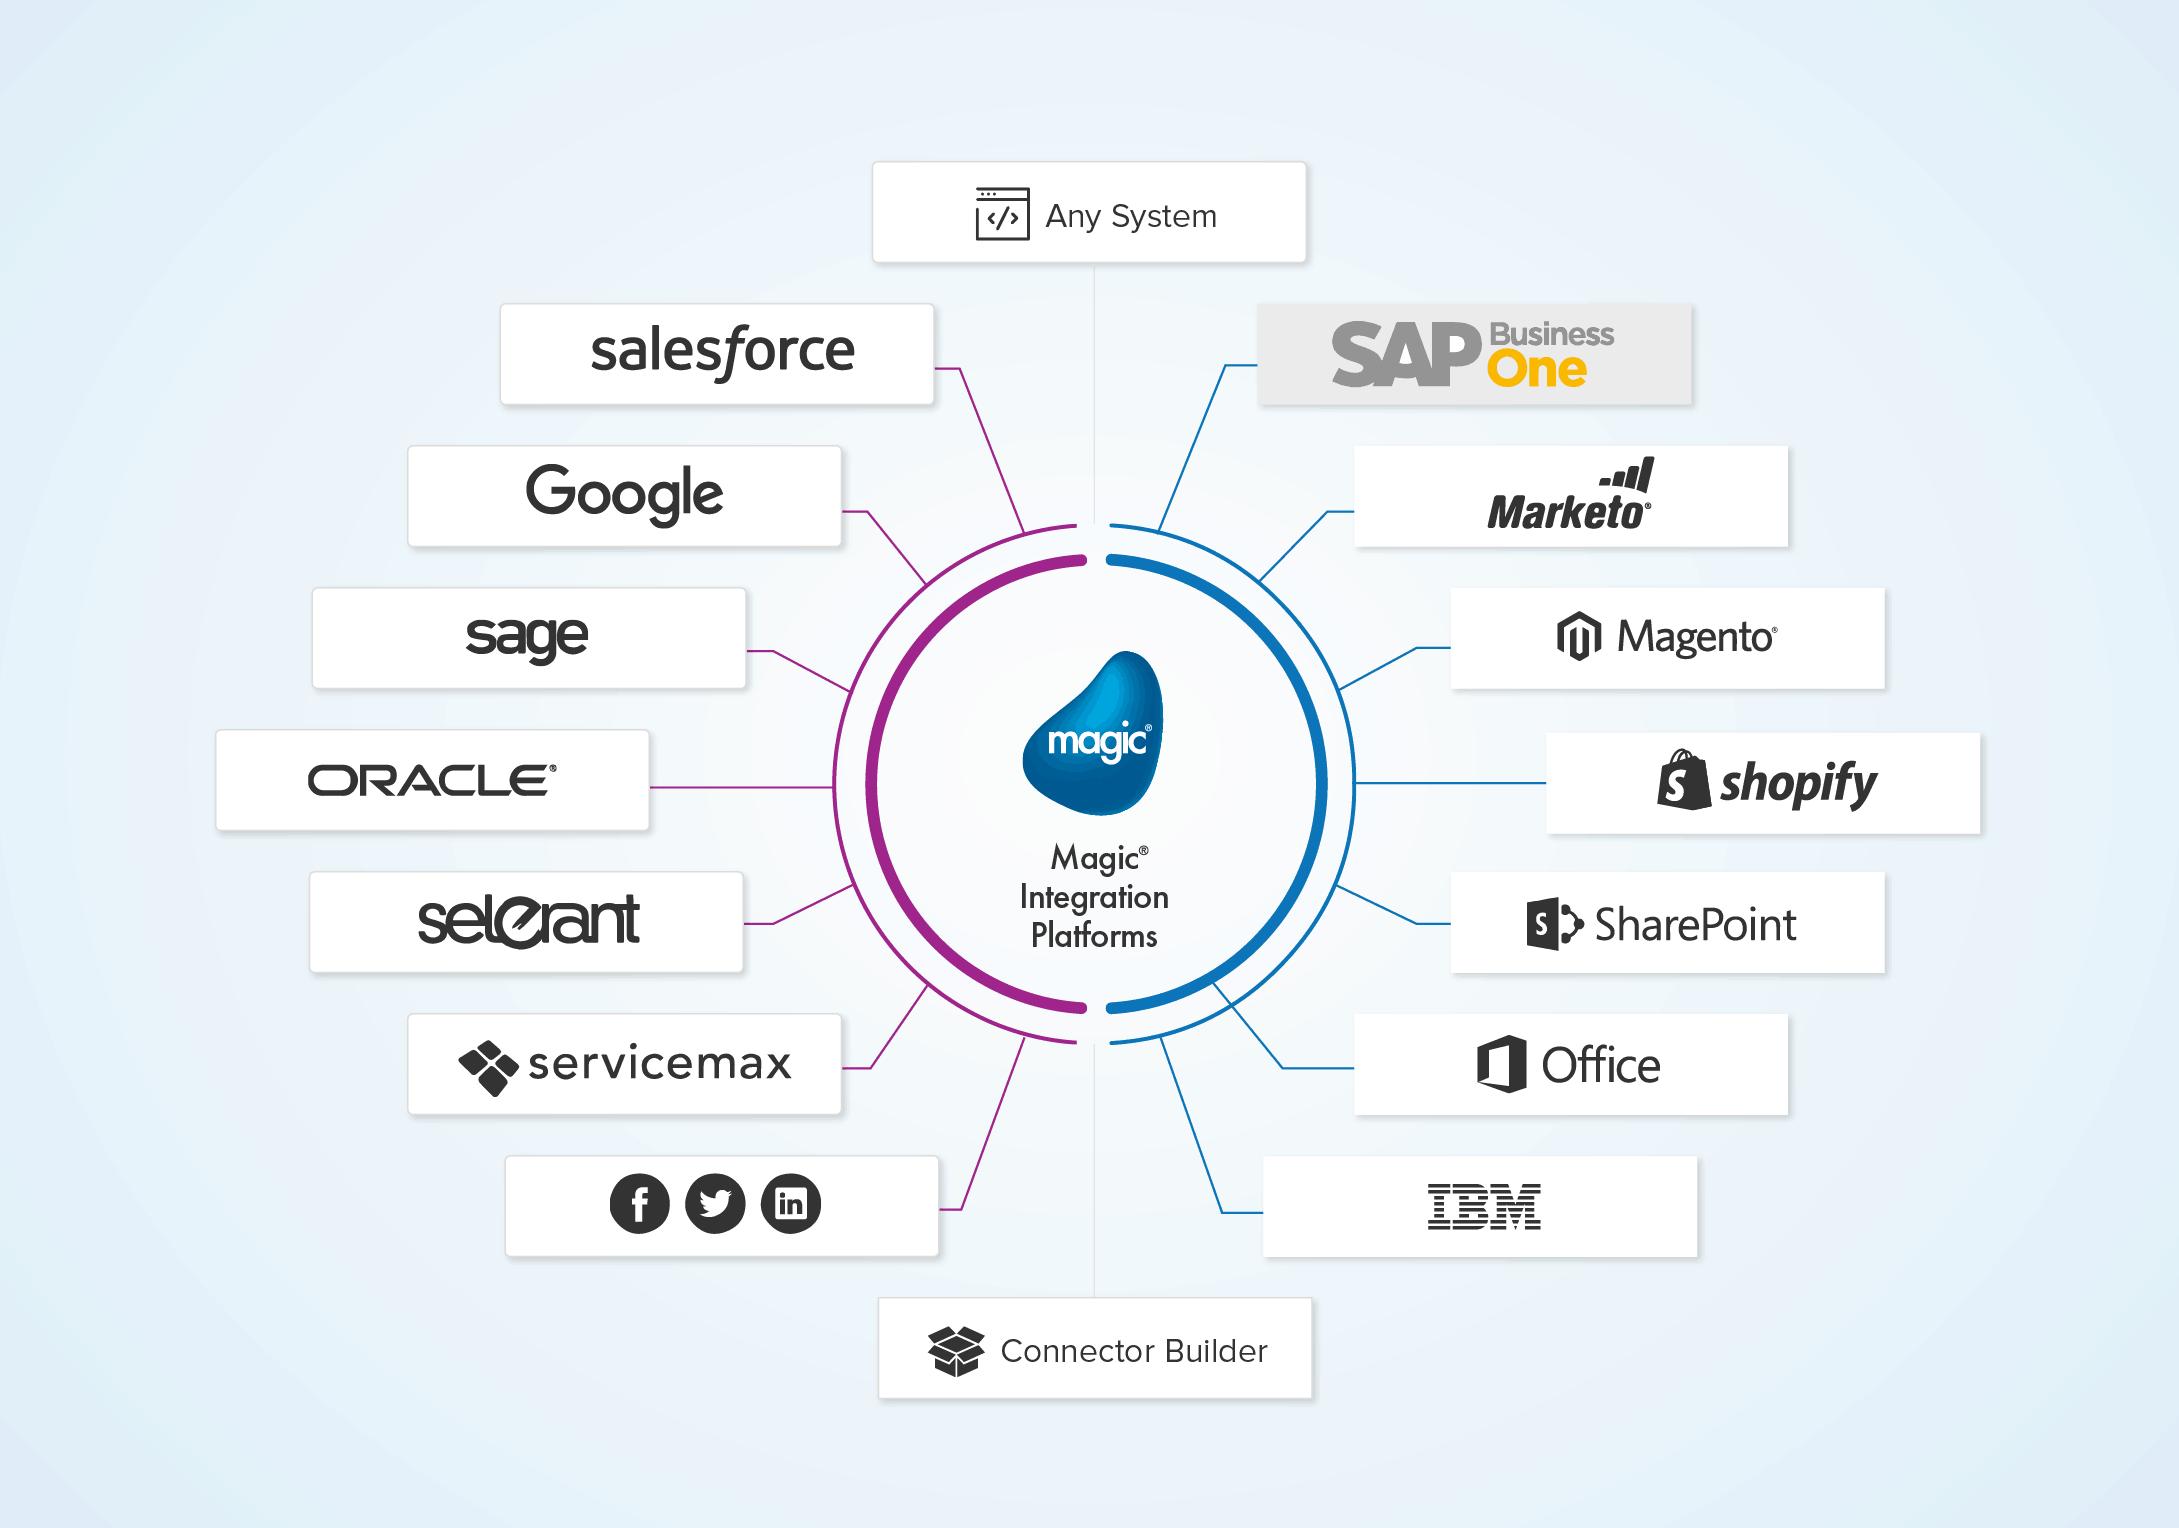 SAP Business One Integration Platform l Magic Software